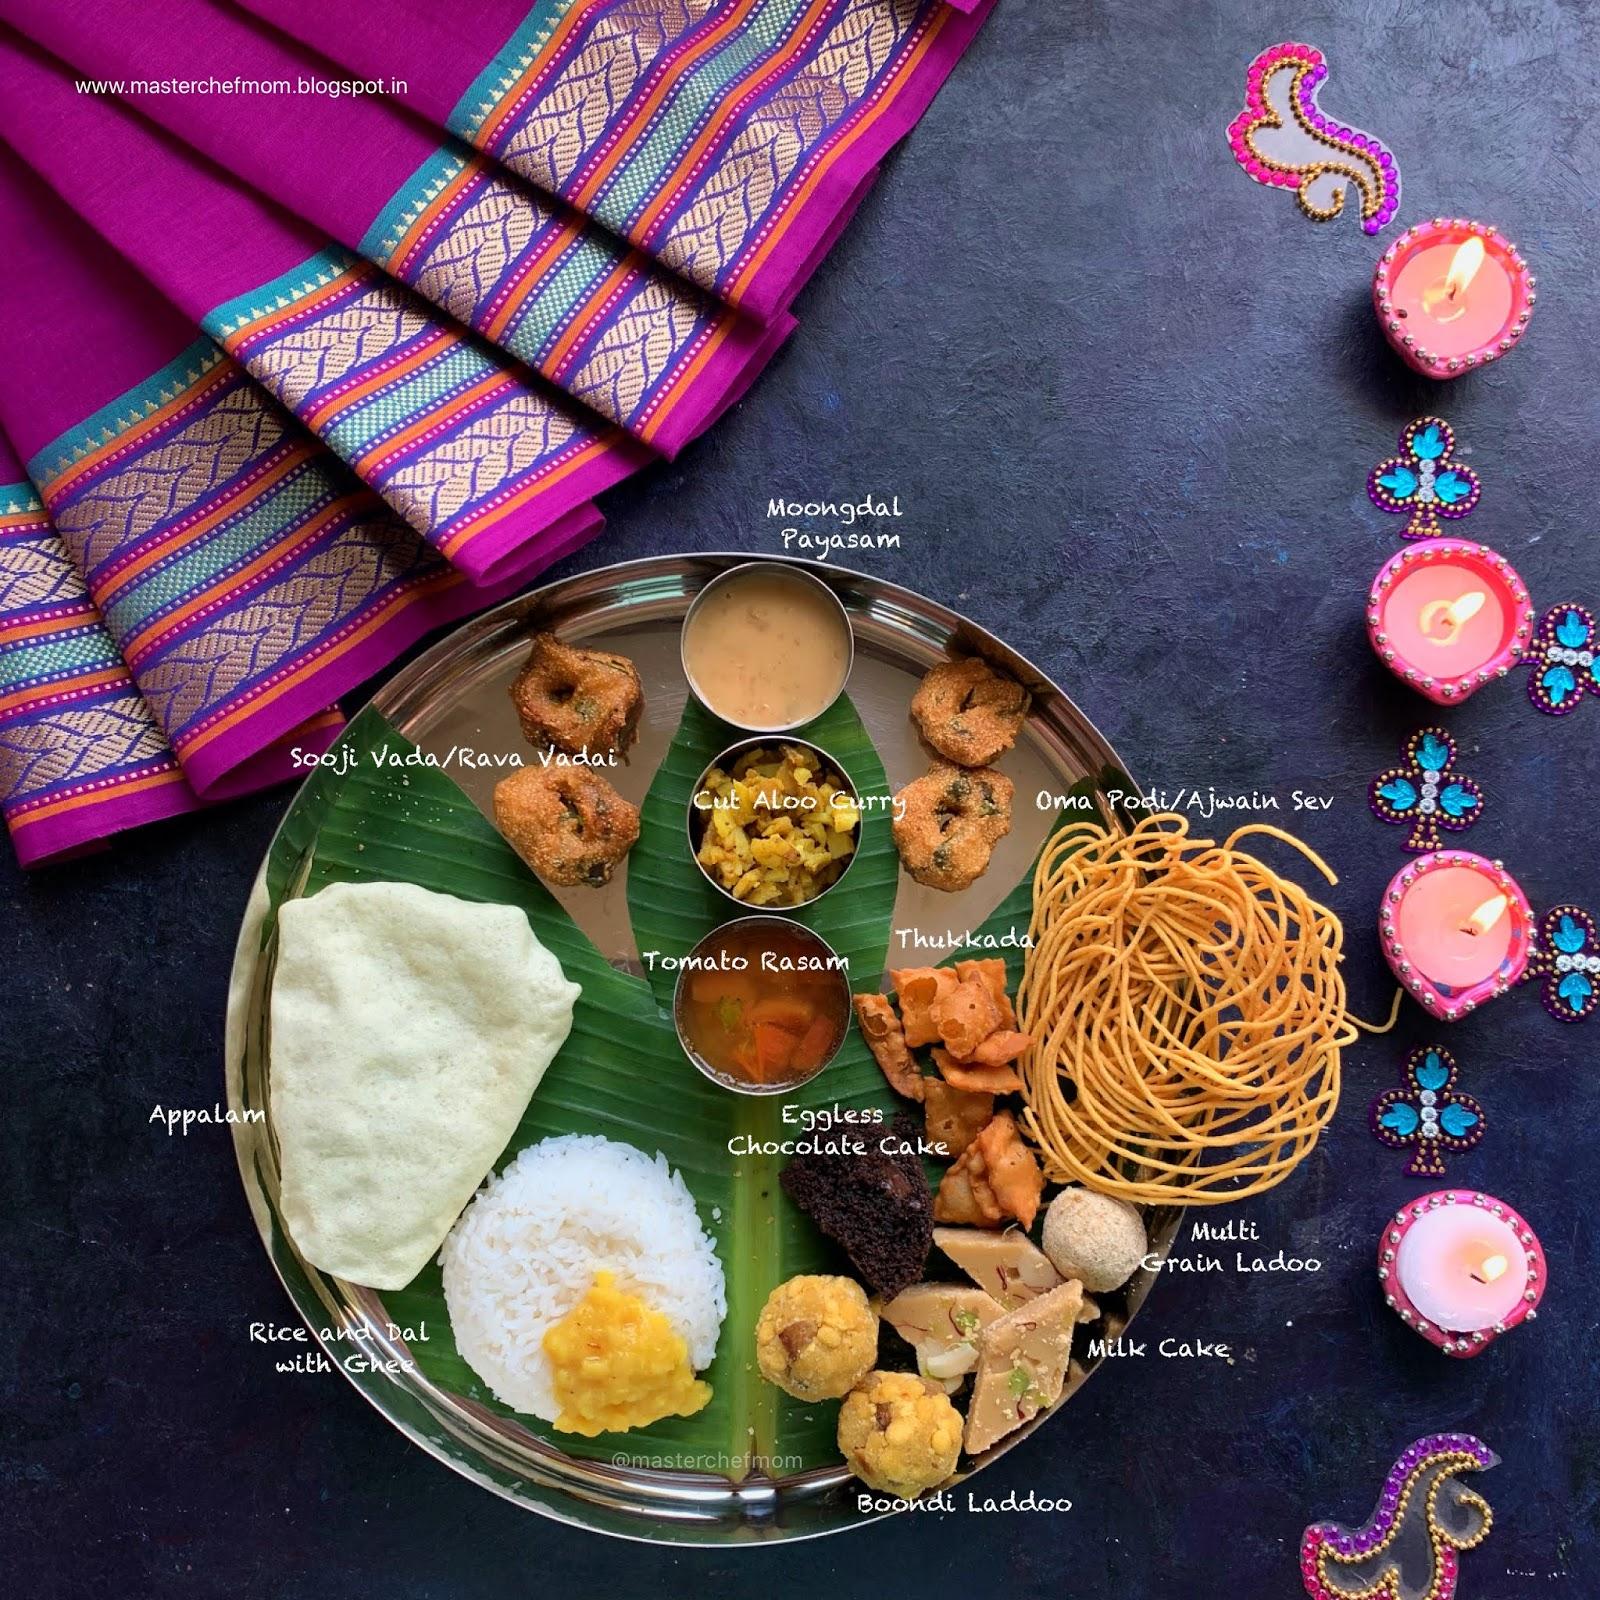 Masterchefmom Diwali 2019 Thali Indian Thali Ideas By Masterchefmom 017 Festival Thali And An Announcement